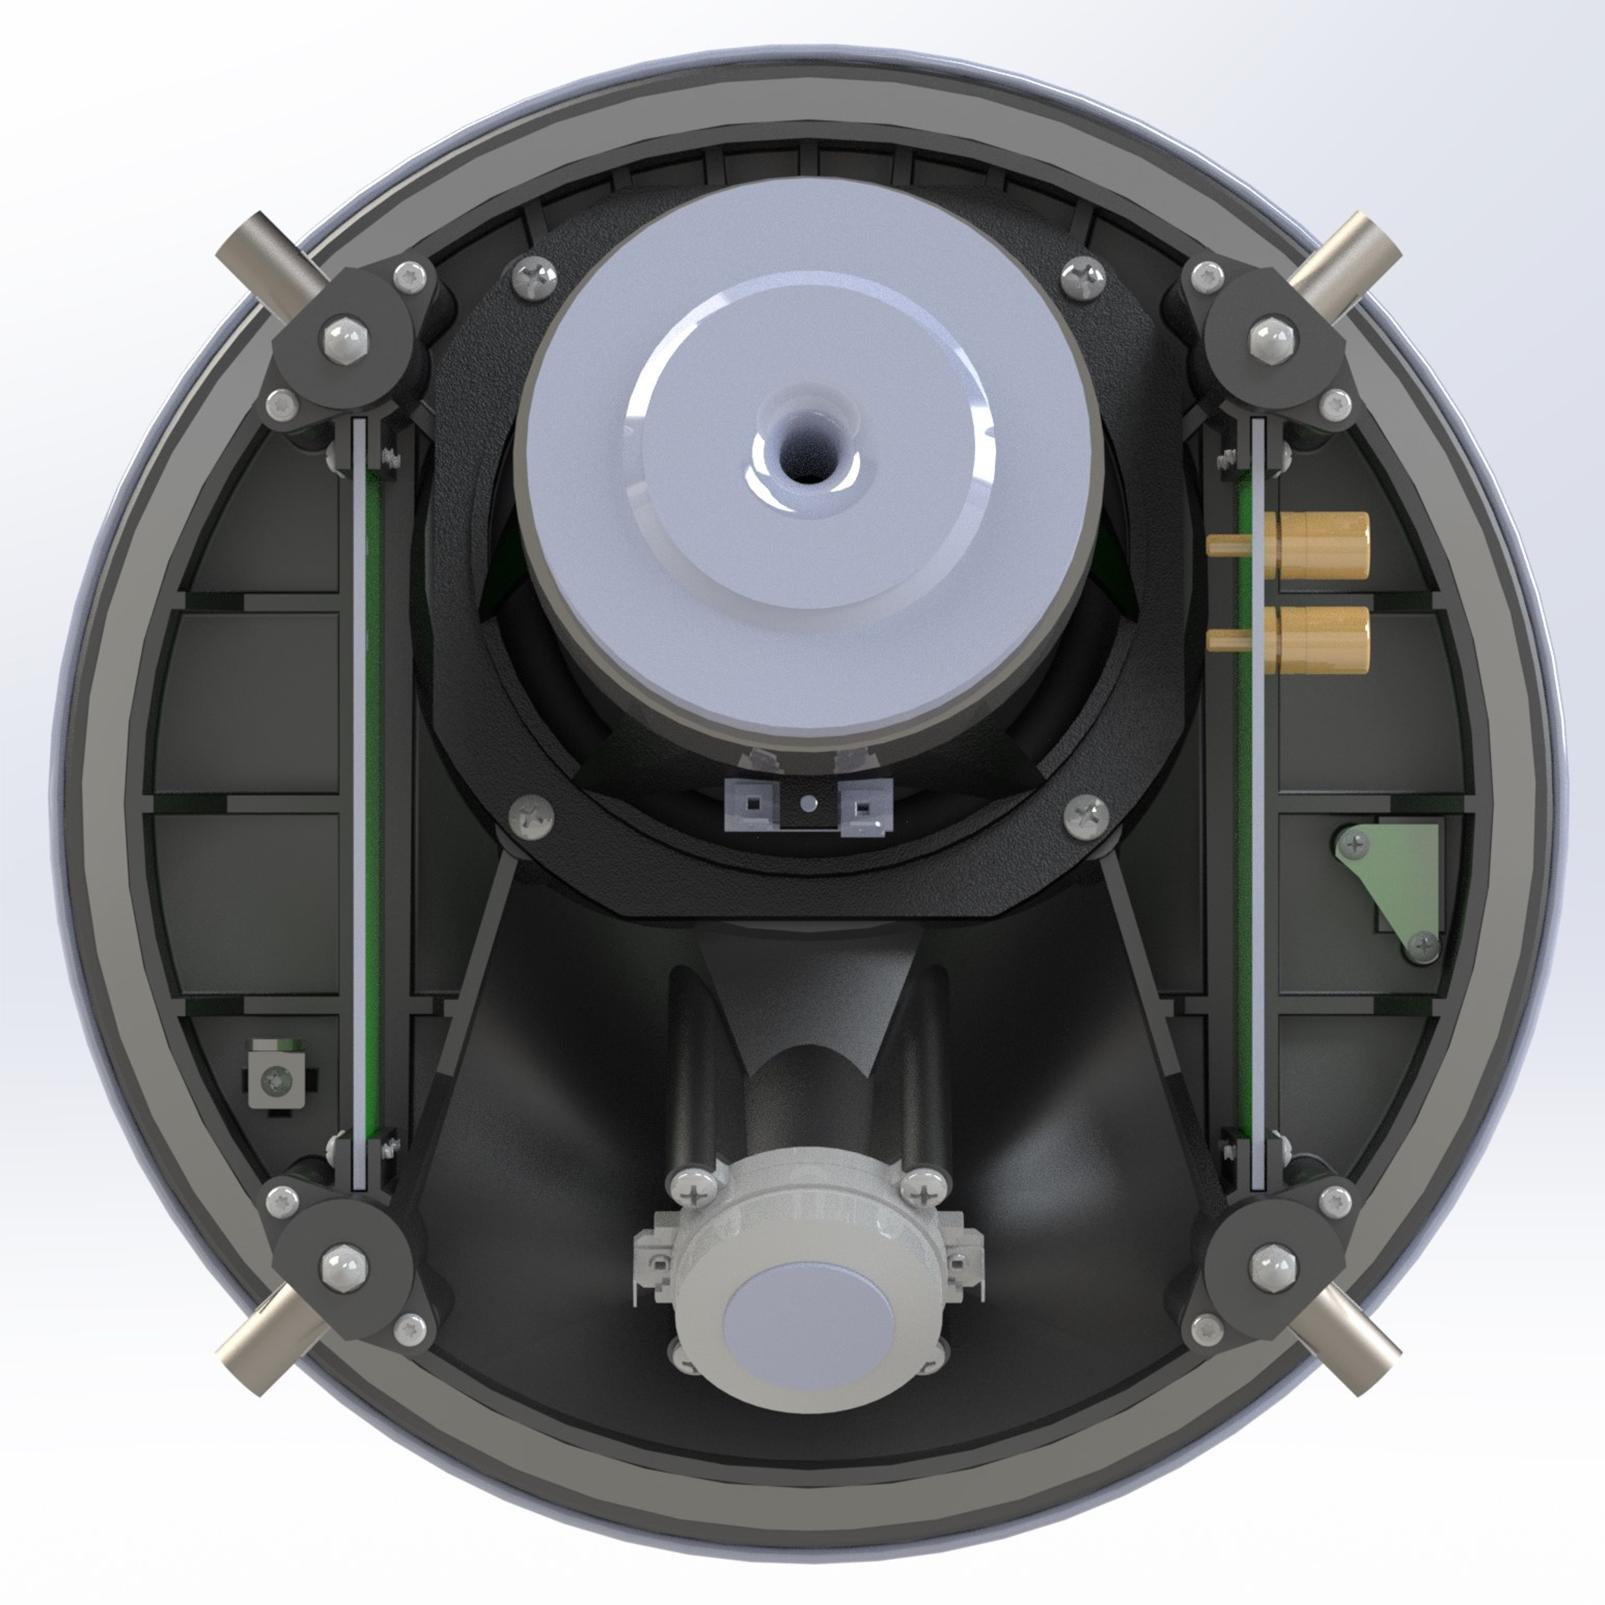 SCL-8 - Black - 2-Way 5.25-inch (130mm) In-Ceiling Loudspeaker - Back